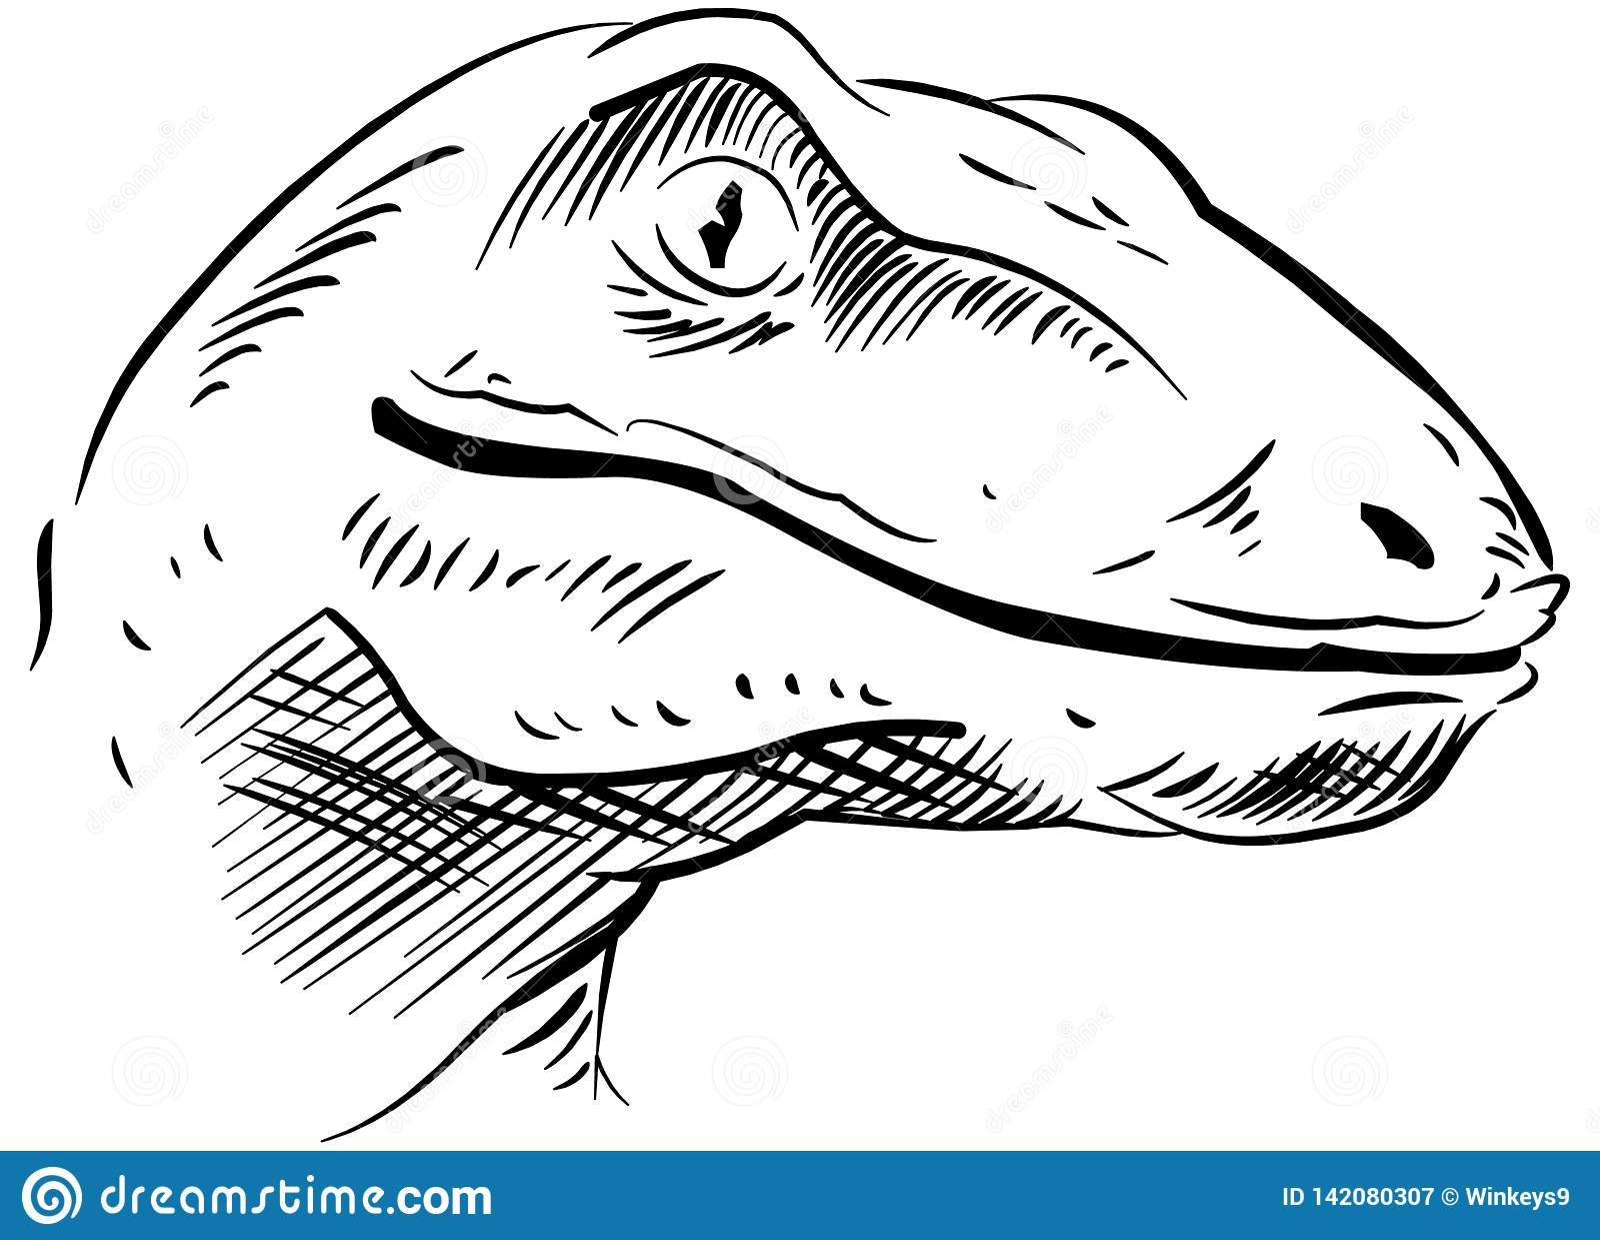 Croquis de la tête de dinosaure